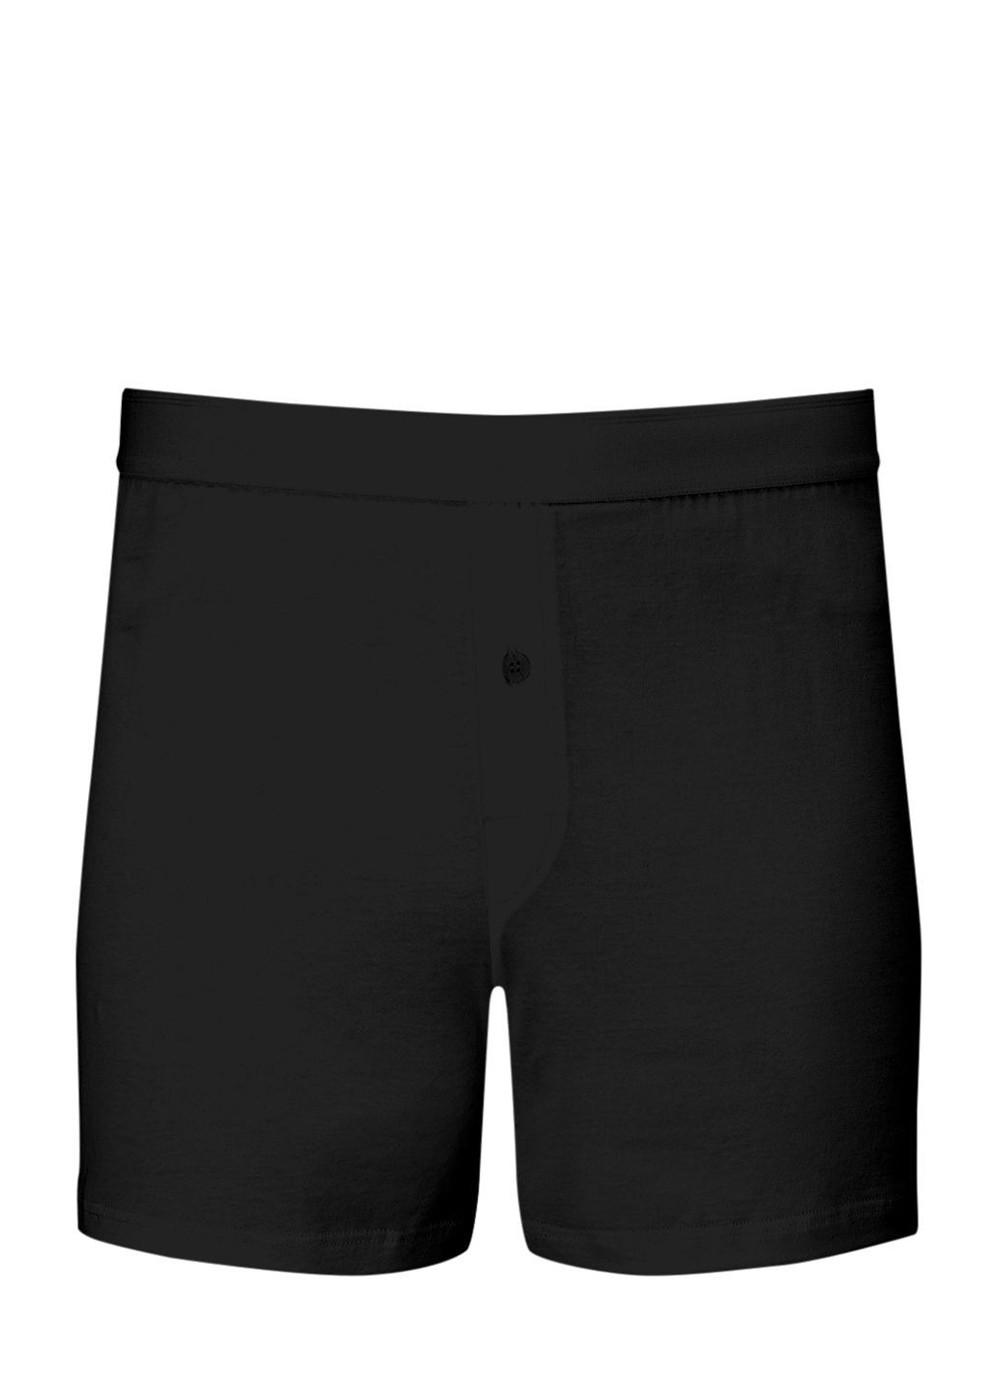 059ab01ff5 Lyst - Sunspel Men's Superfine Cotton One-button Shorts In Black in ...